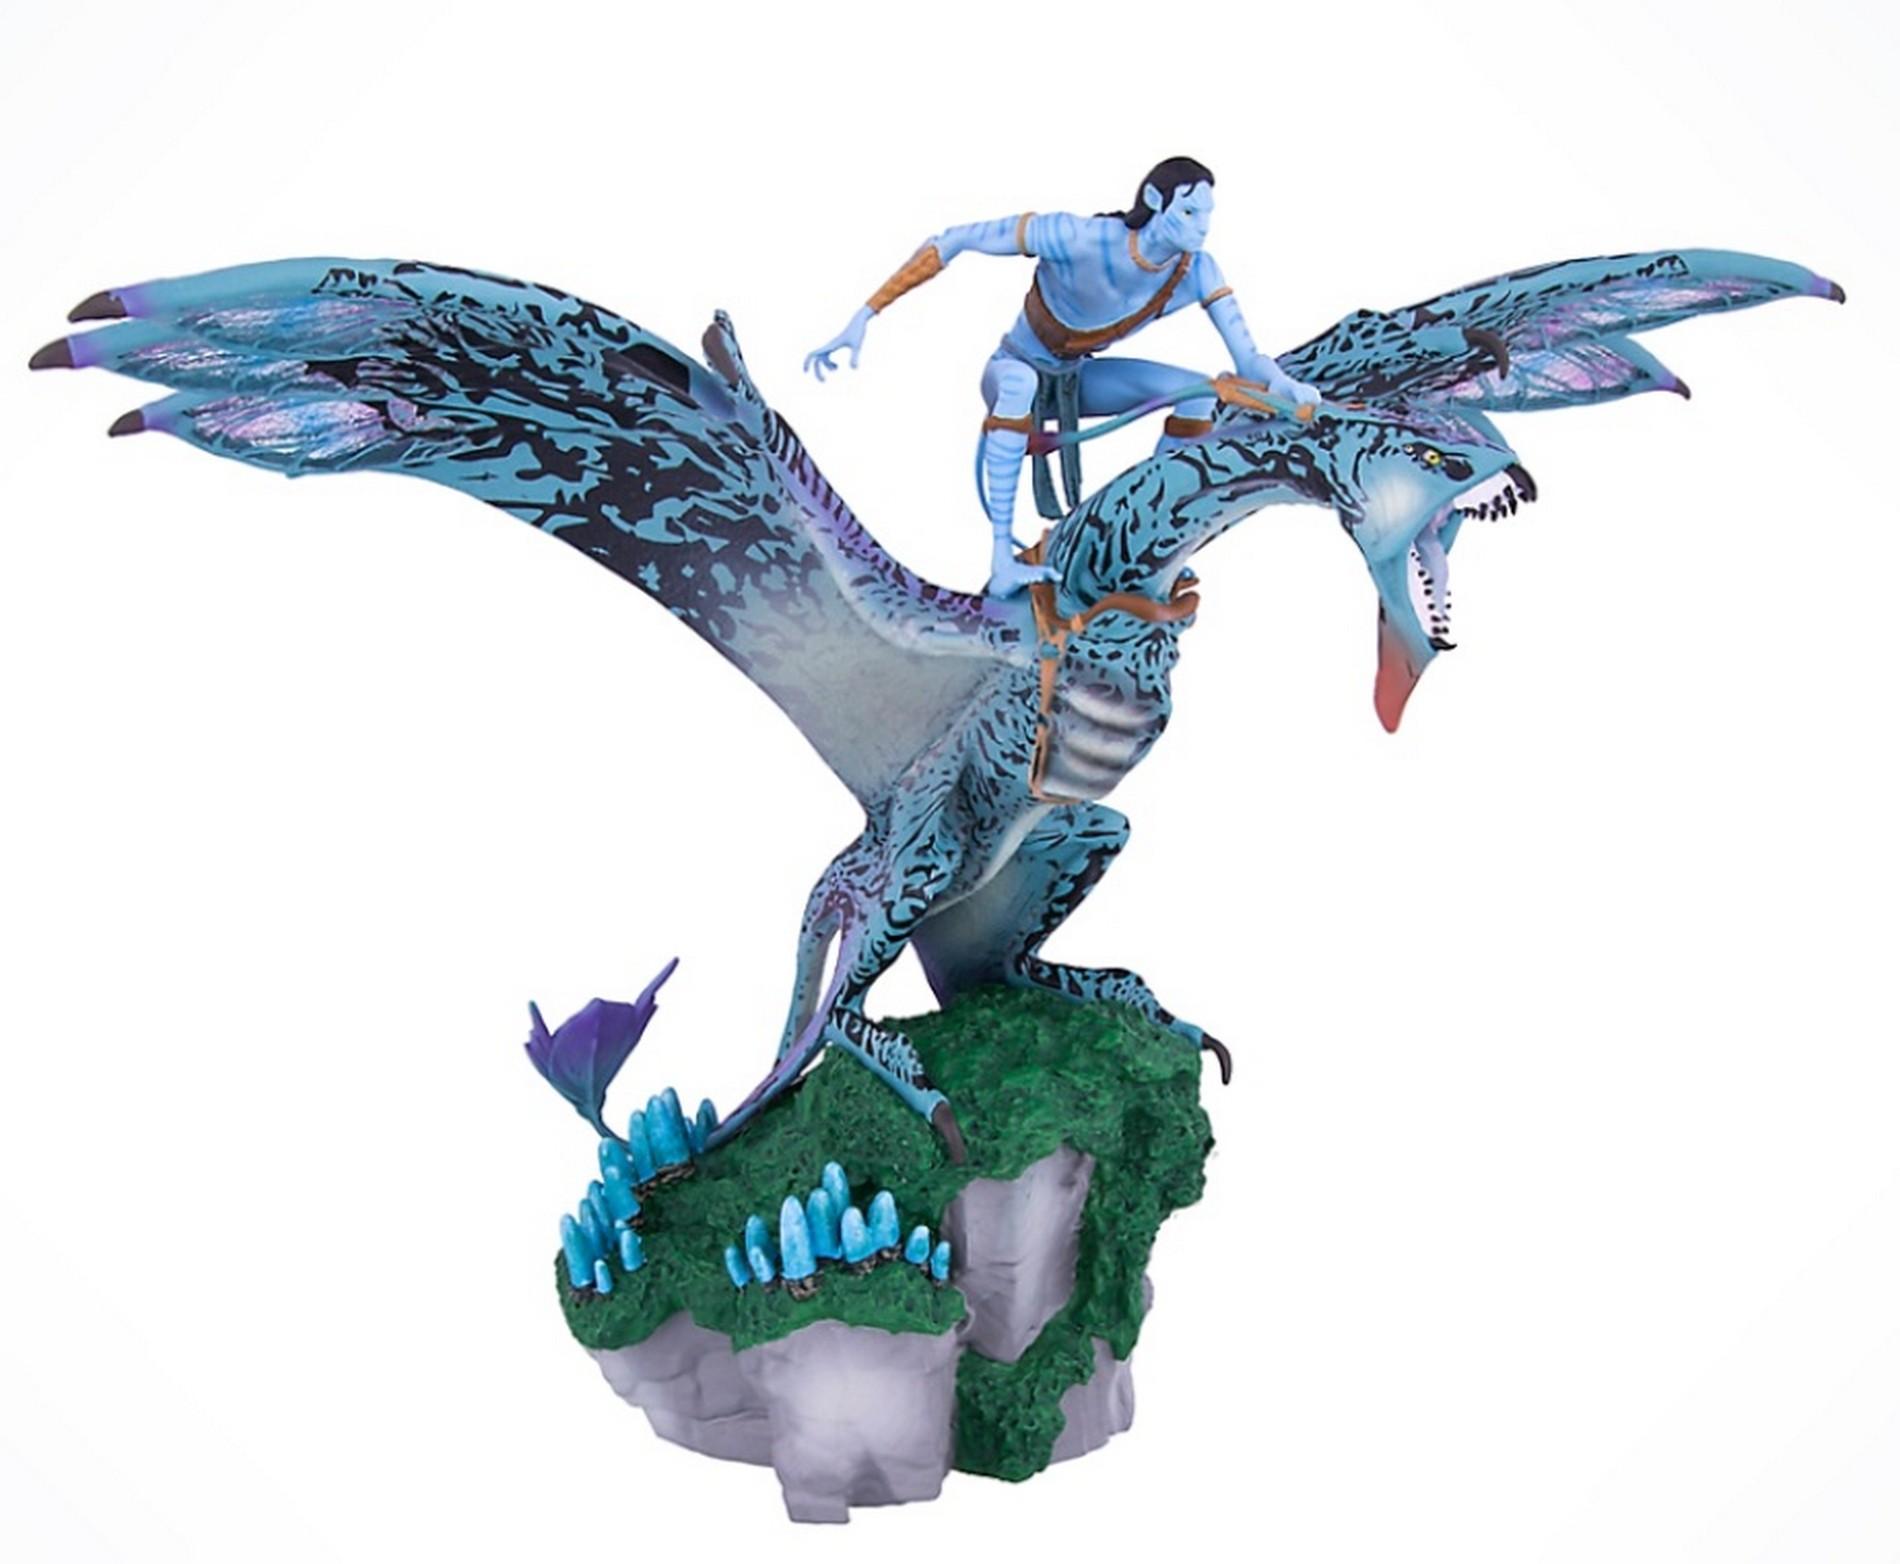 Avatar Jake Sully Riding A Banshee Medium Big Fig - Disney Pandora – The World of Avatar © Dizdude.com